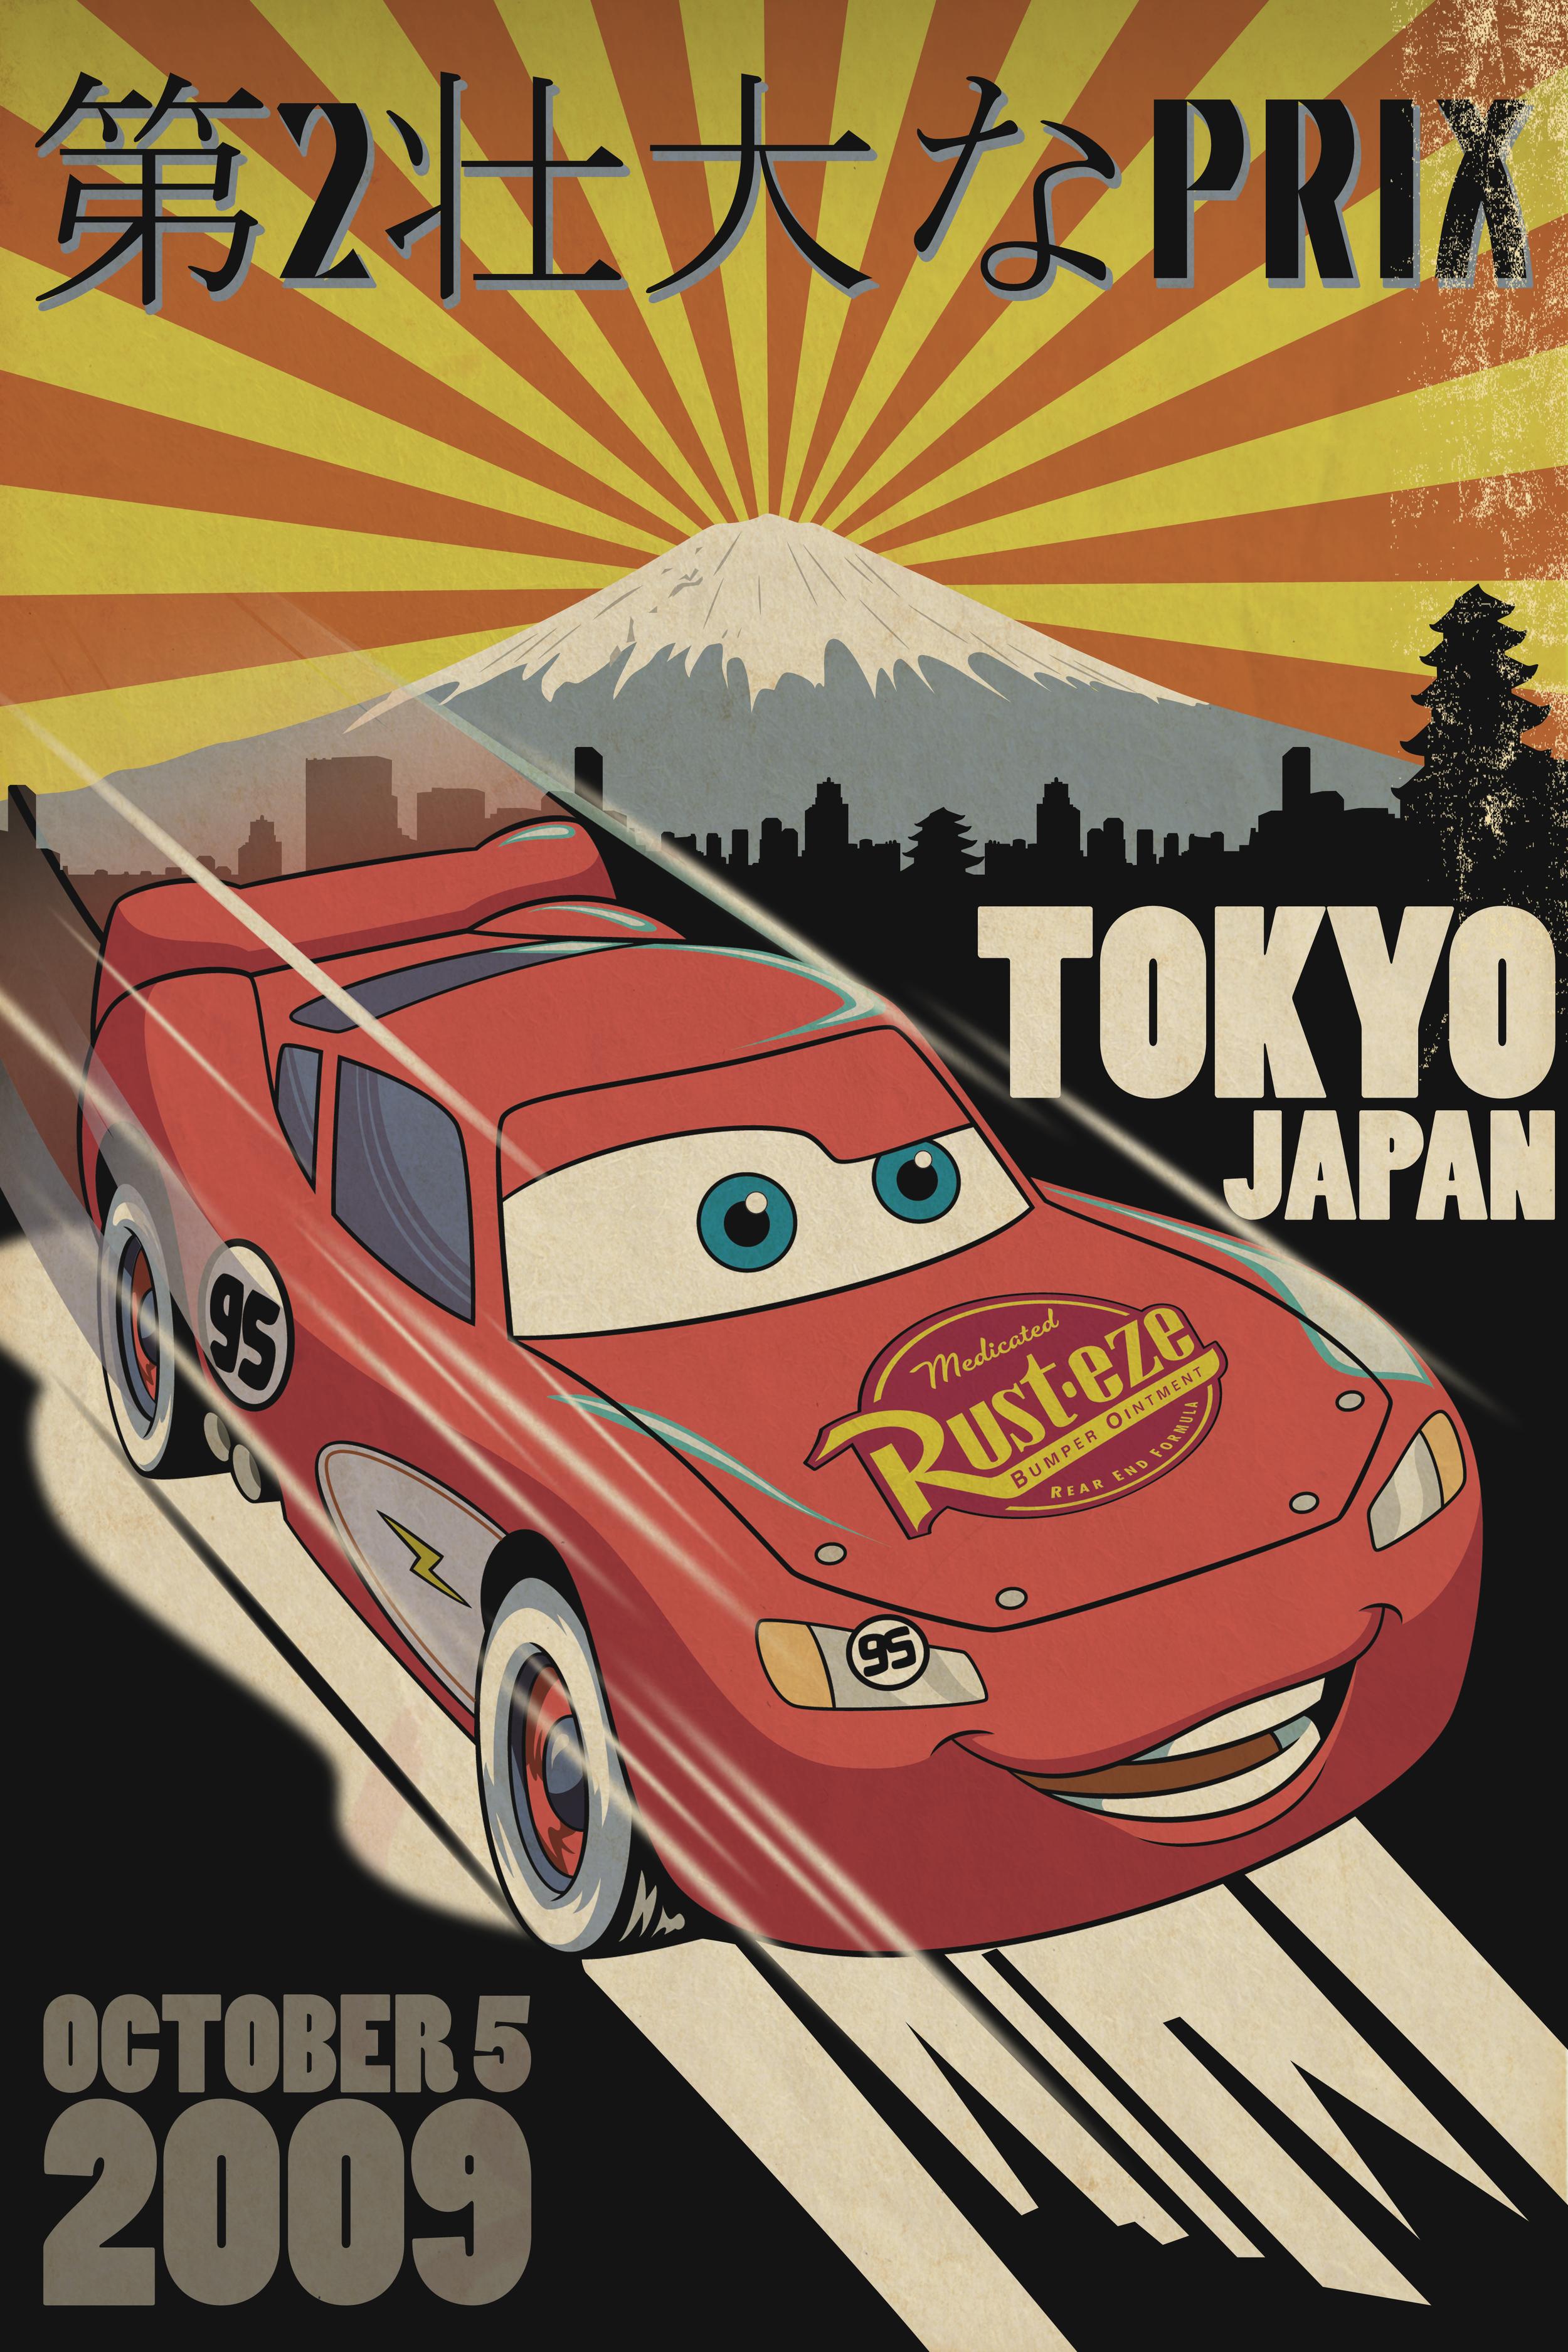 Cars-Japan-Poster-2_Flat.jpg